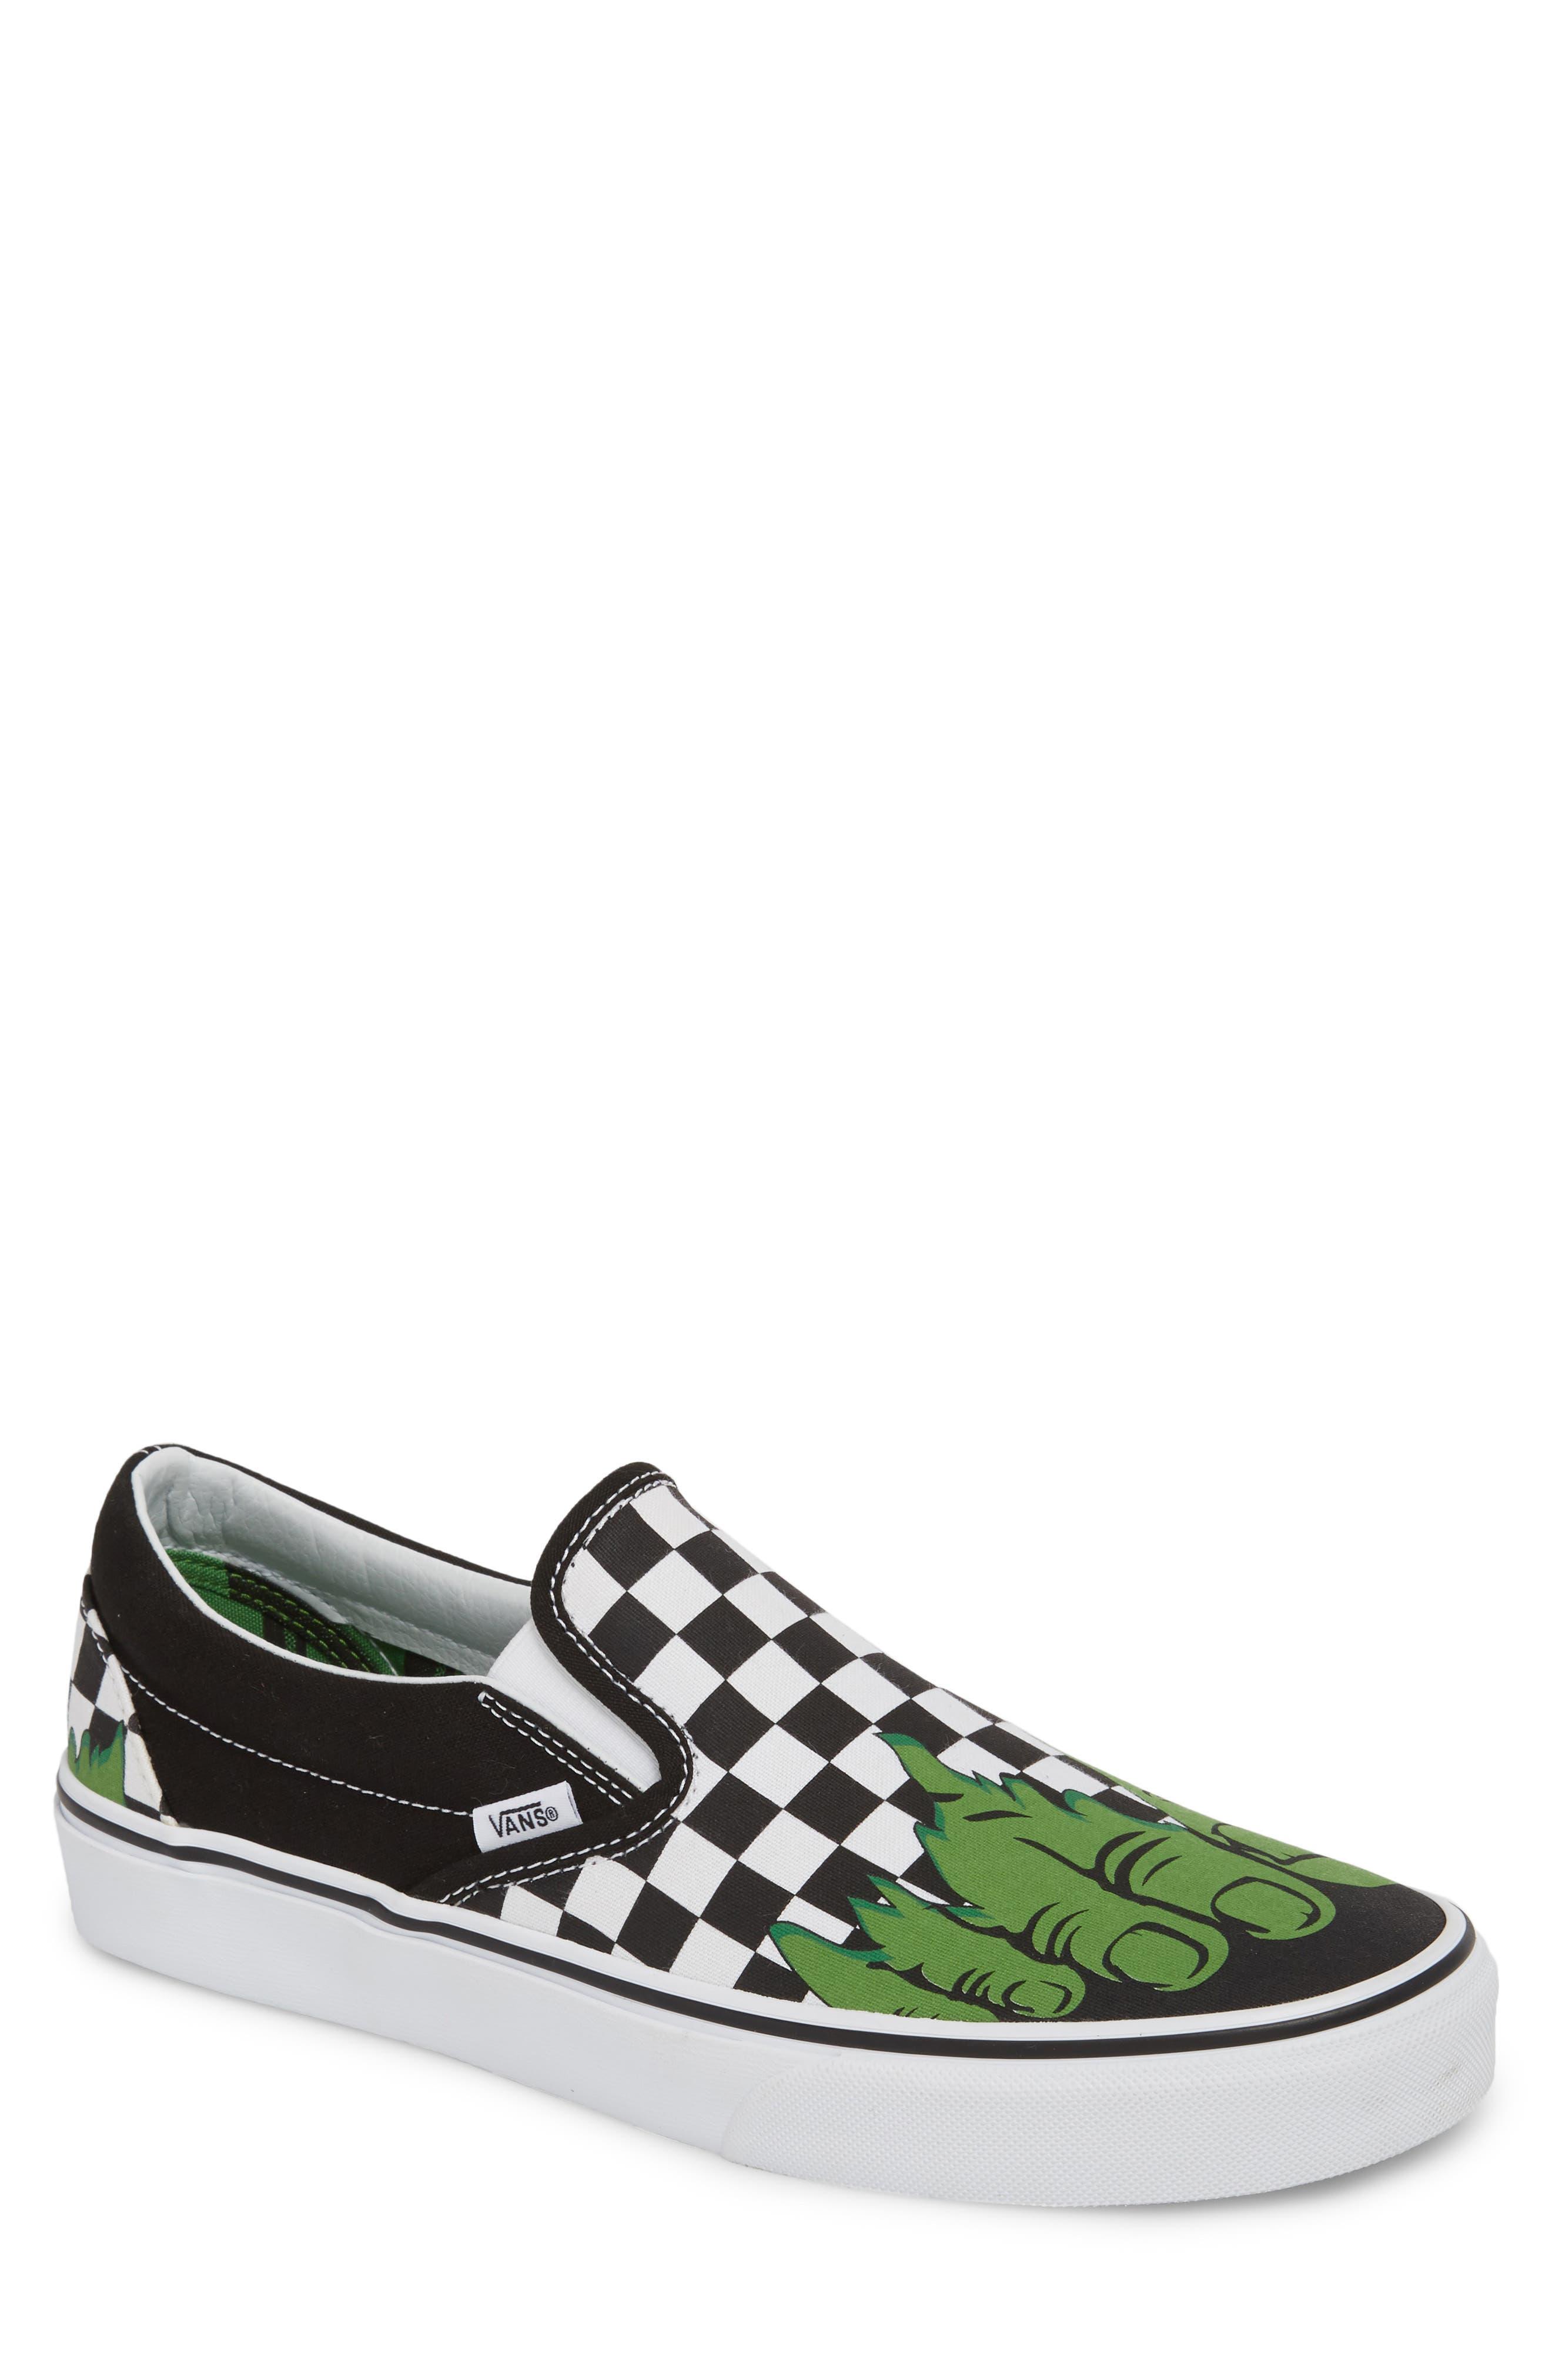 Marvel UA Classic Slip-On Sneaker,                         Main,                         color, Checkerboard Textile